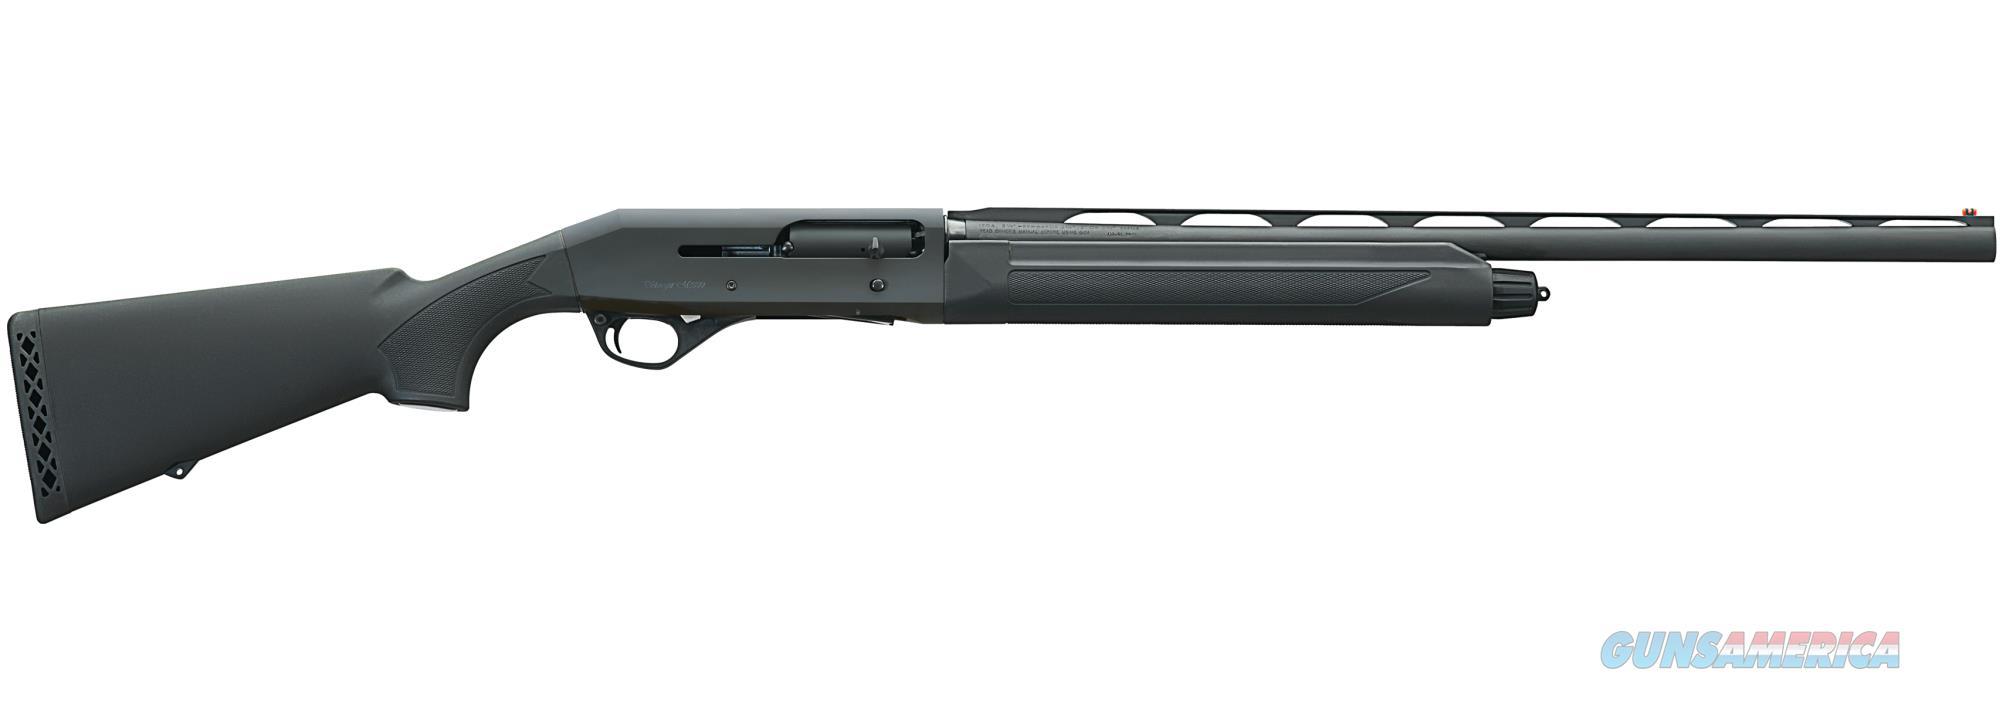 "Stoeger M3500 12 Ga., 28"" barrel, Blk Syn Stock, Mfg# 31810, 3 1/2"", NIB  Guns > Shotguns > Stoeger Shotguns"